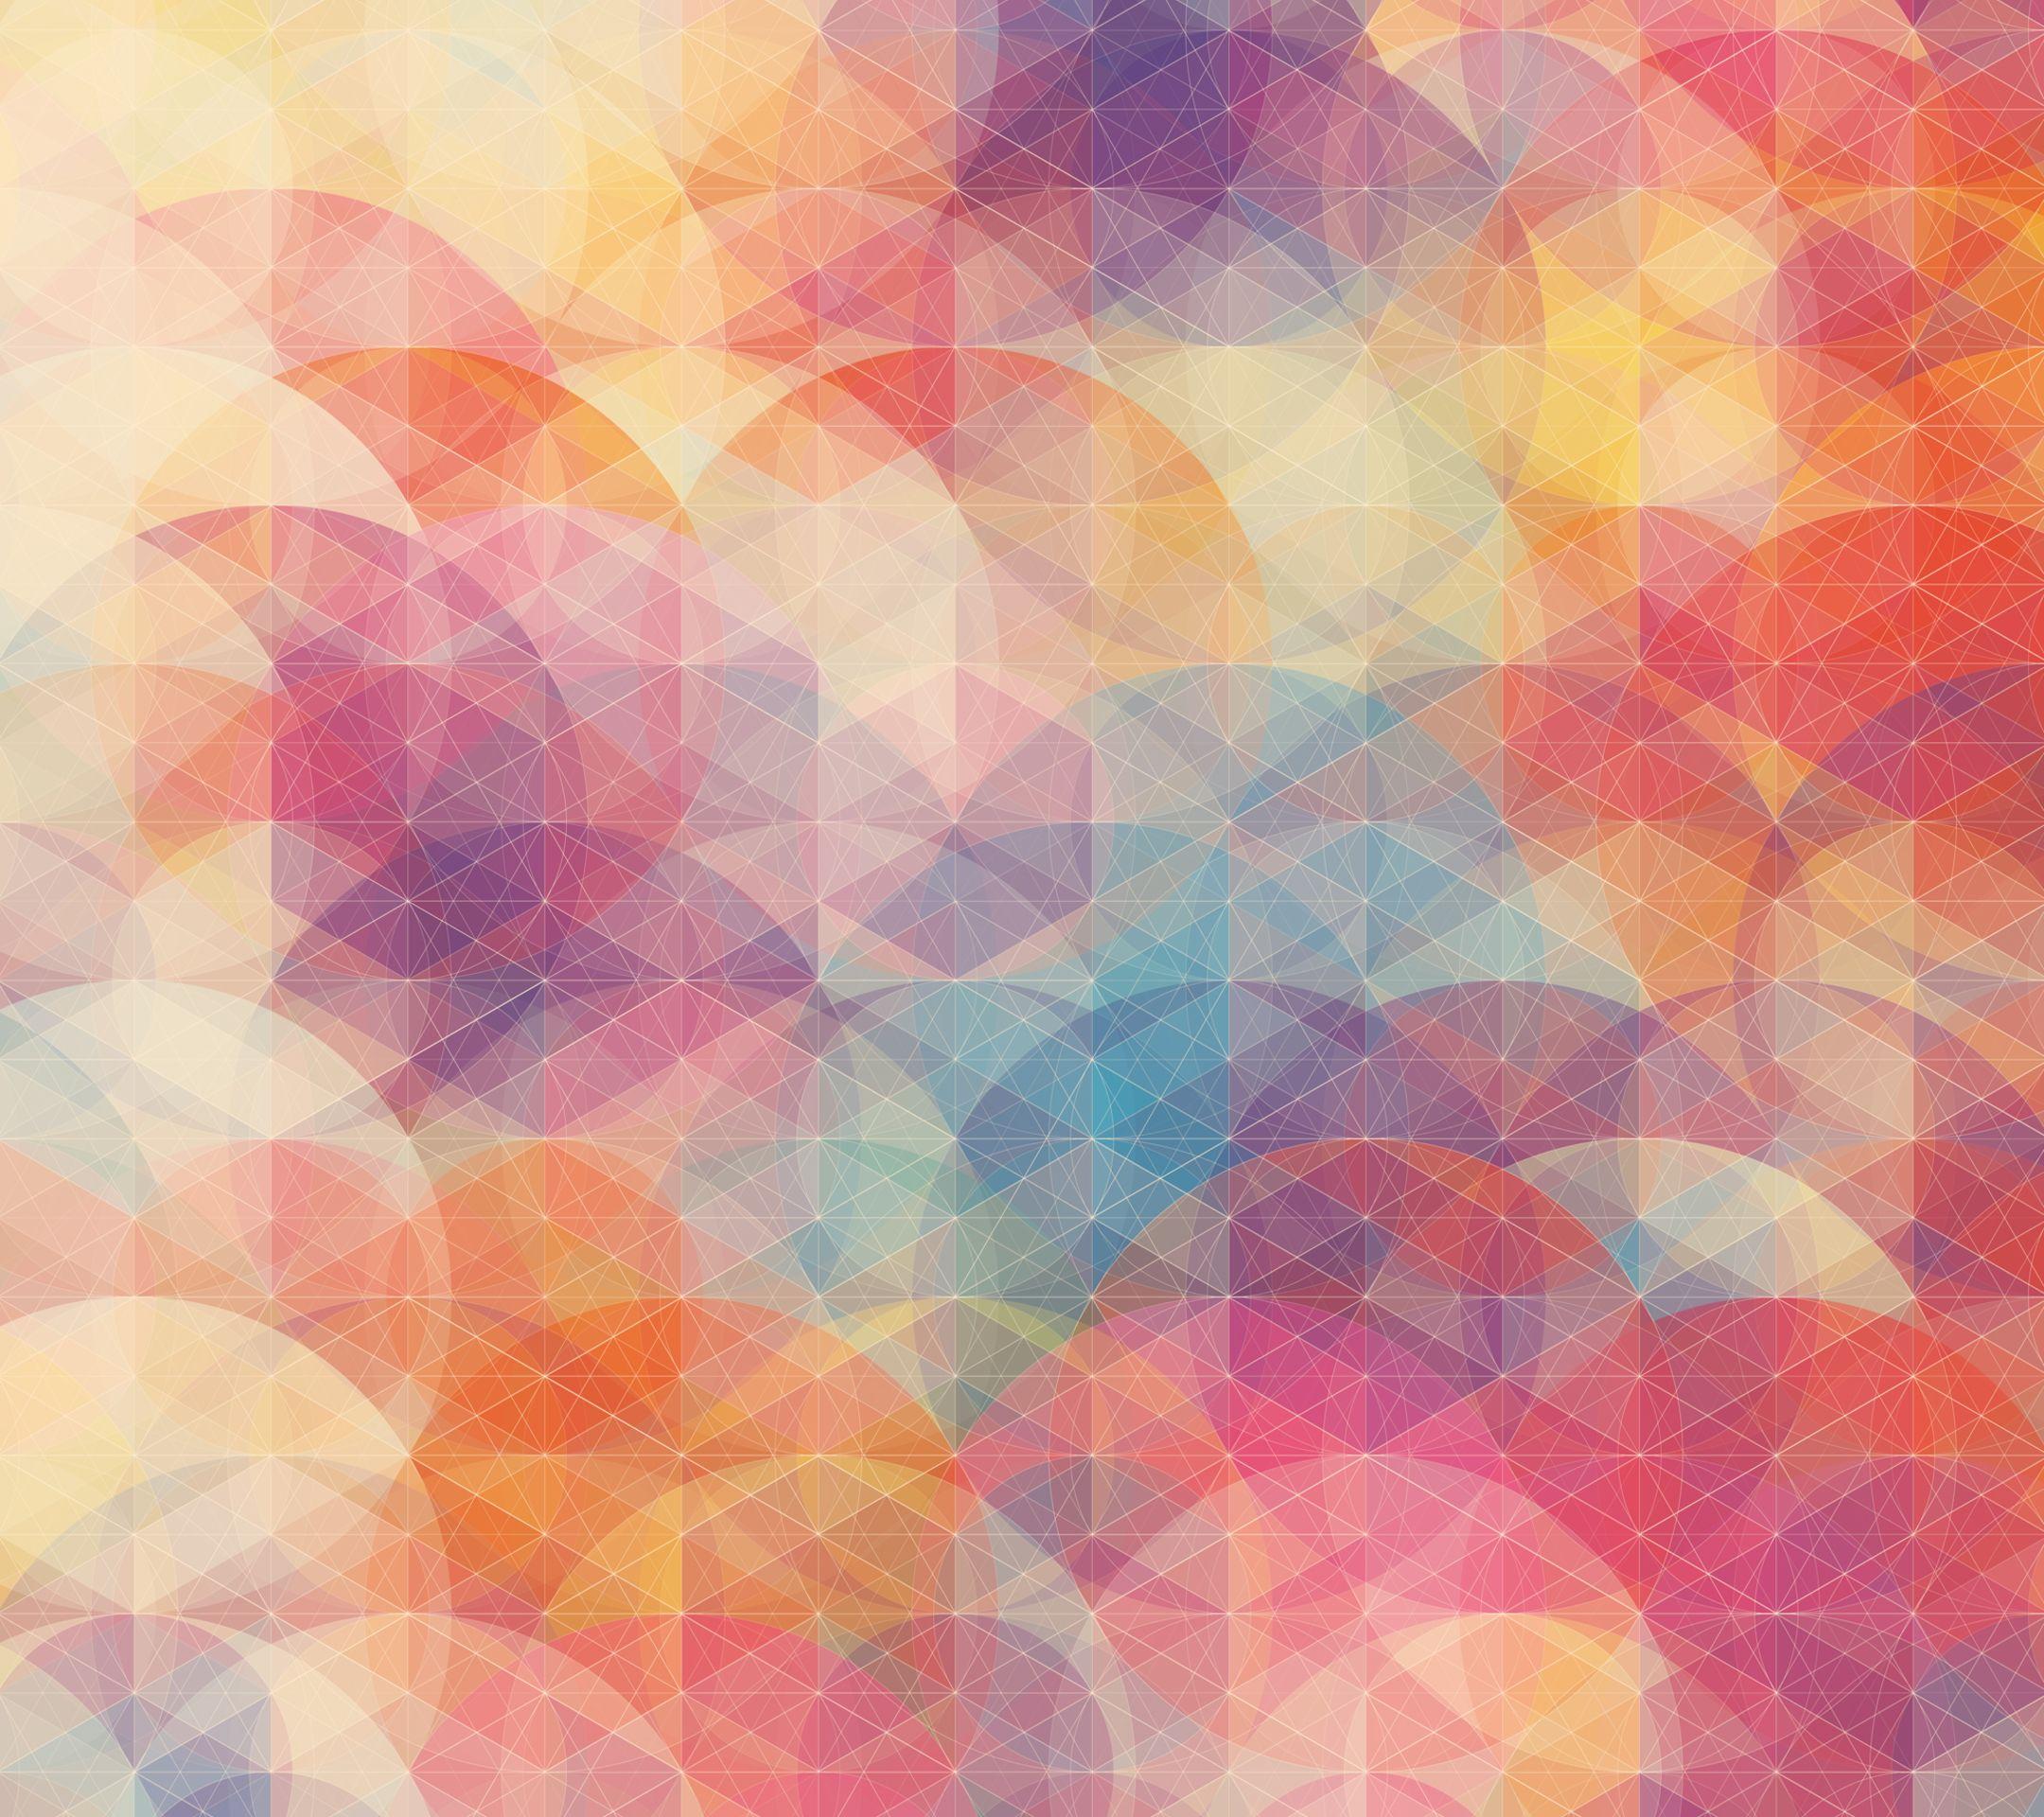 Orange iphone wallpaper tumblr - Background Tumblr Pattern Google Keres S Iphone 6 Wallpaperwallpaper